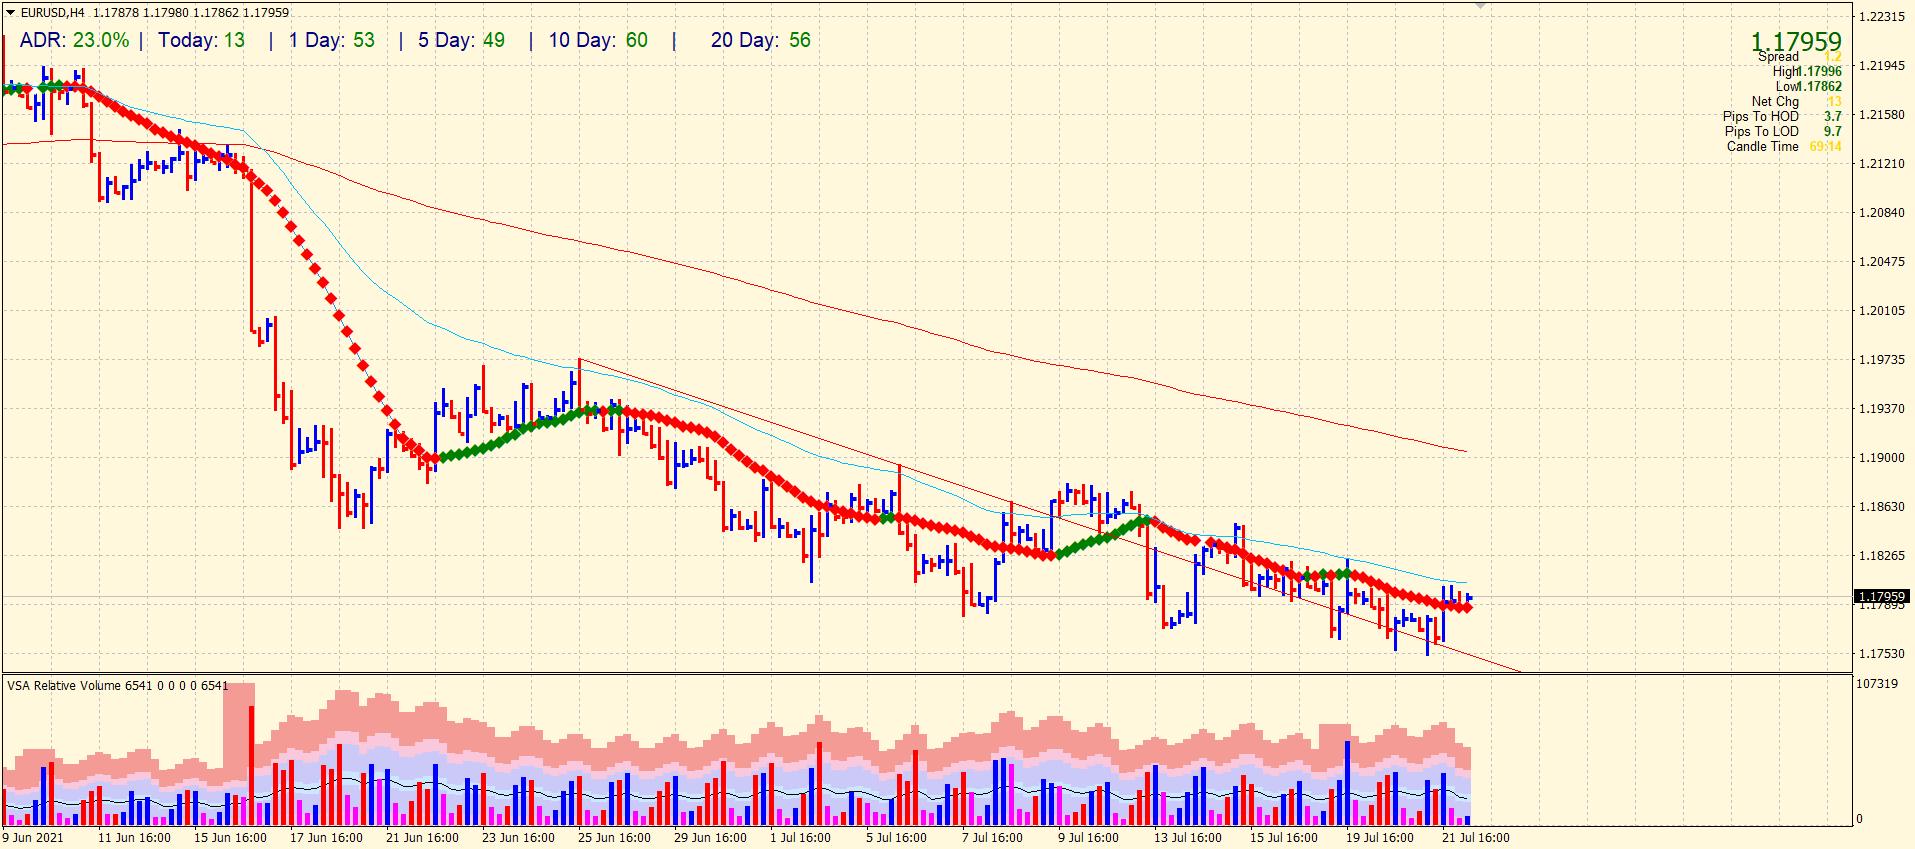 EUR/USD price analysis 4-hour chart